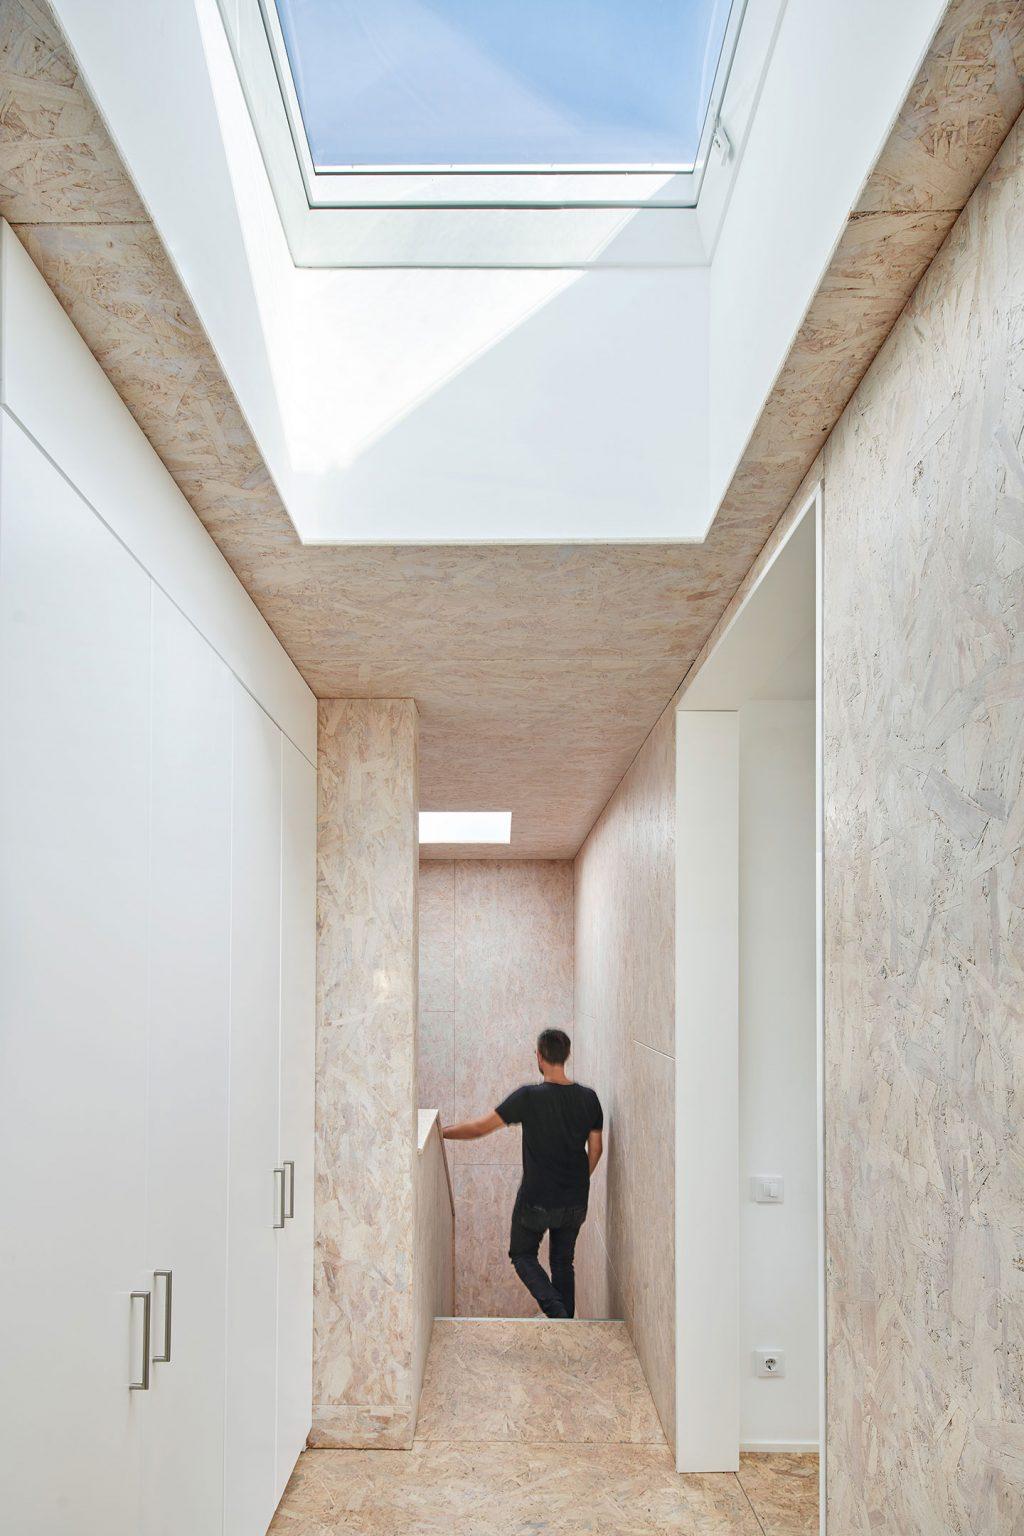 escales argentona casa passiva papik cases passives catalunya casa biopassiva casa eficient